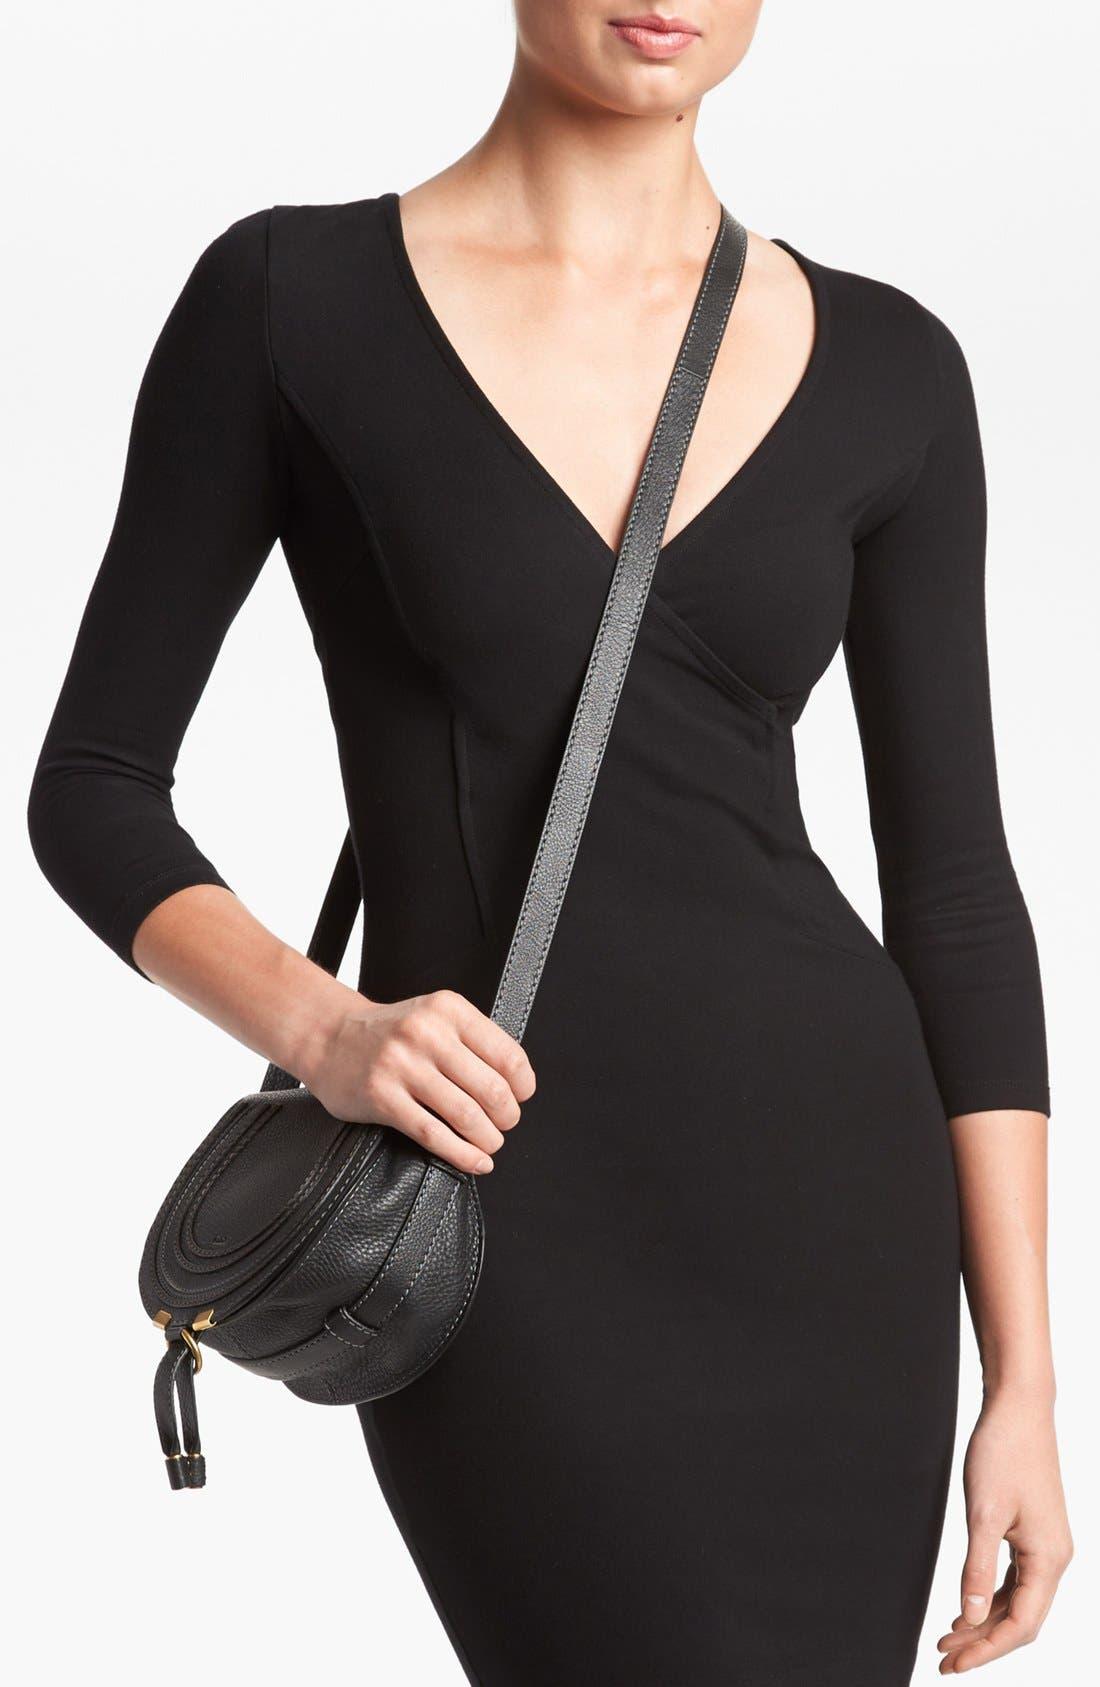 Crossbody Bags All Women Nordstrom Bianca Top Leux Studio Silver L